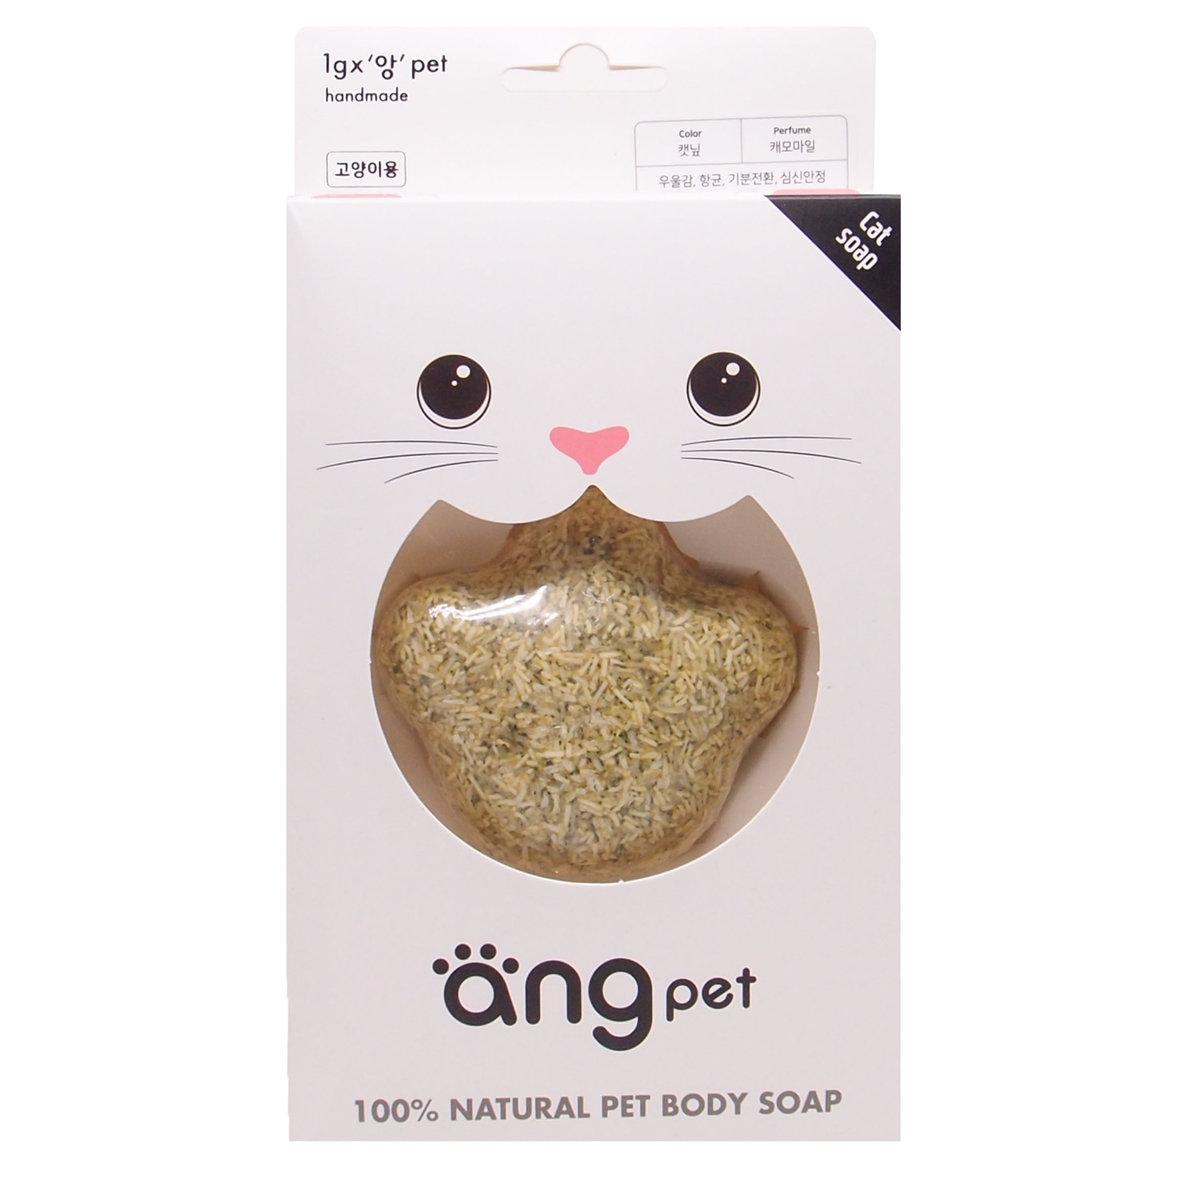 ang pet 100% 天然手制寵物沐浴皂 (貓貓綠色)